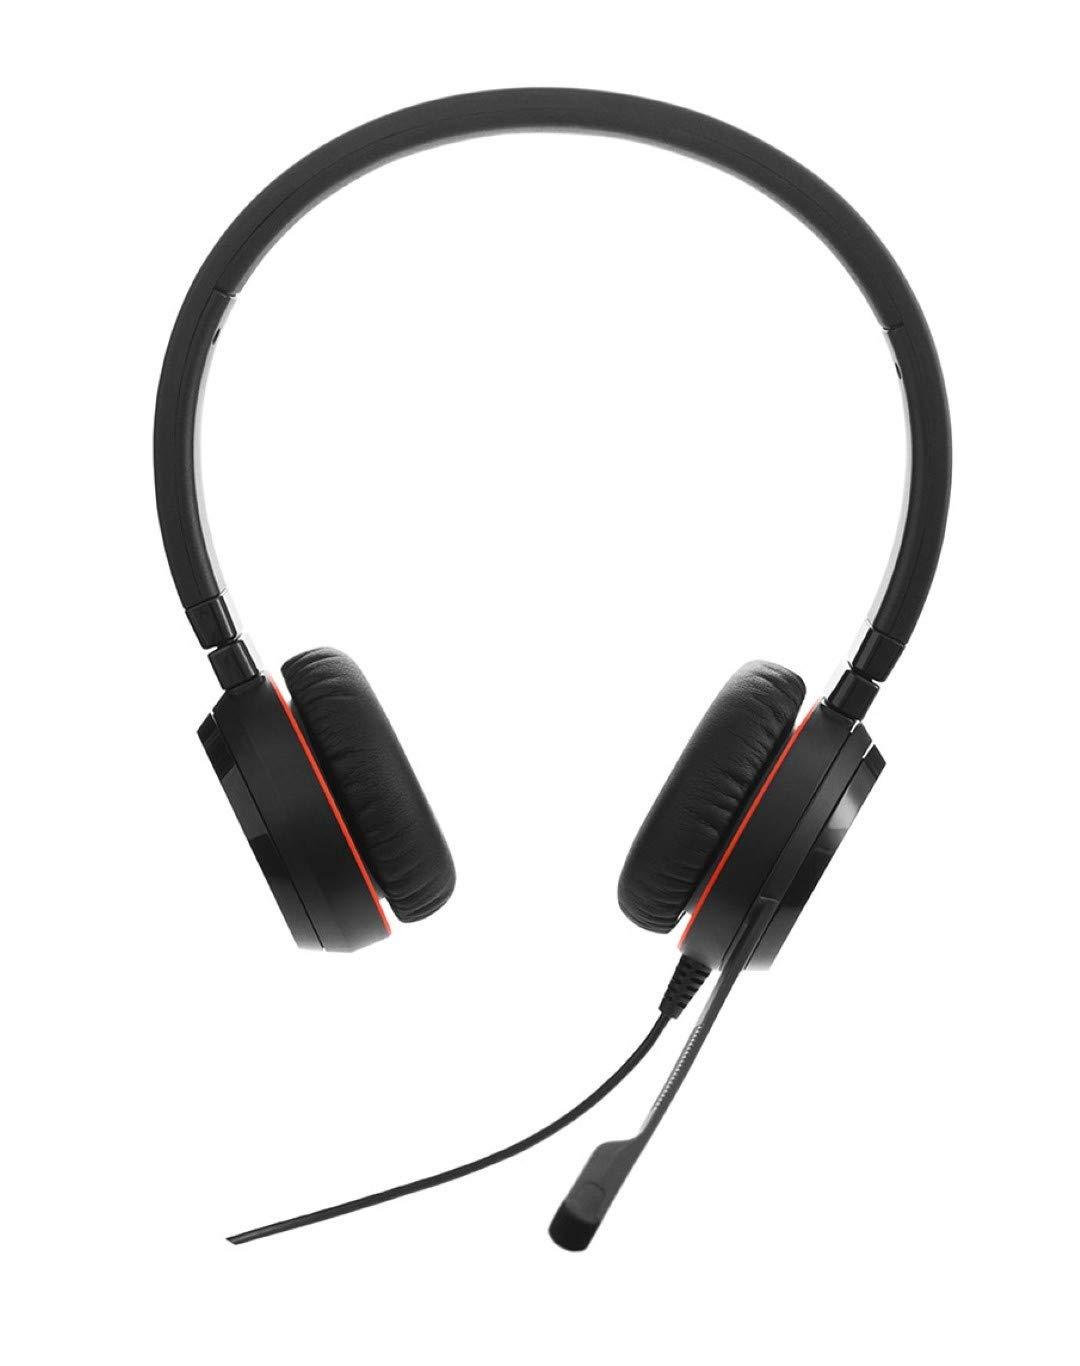 Jabra Evolve 30 II UC Stereo Wired Headset/Music Headphones